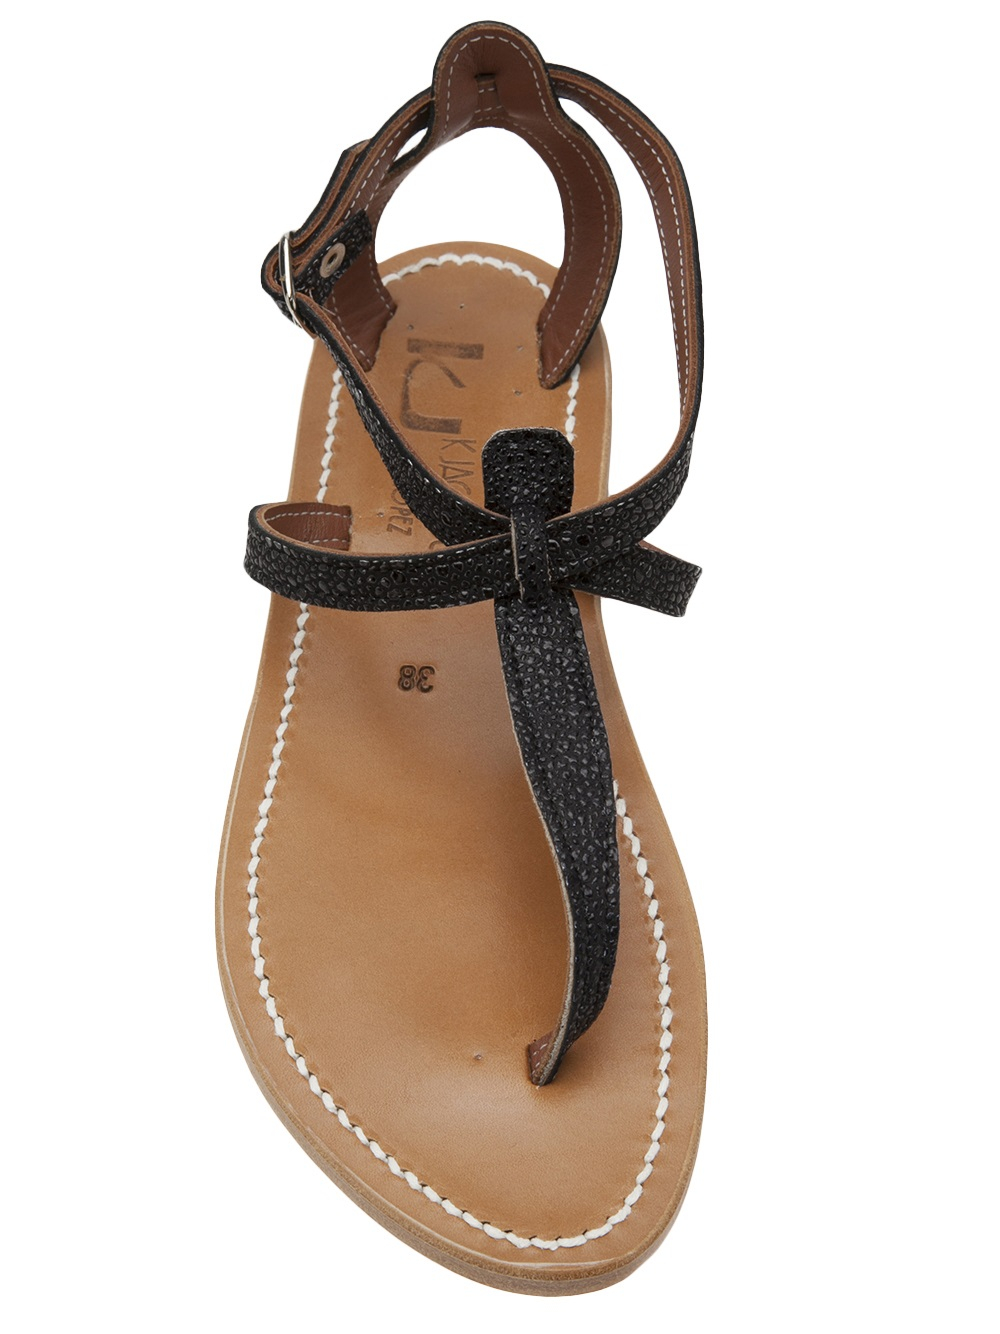 77a7b4f2d4ac Lyst - K. Jacques The Buffon Sandal in Black